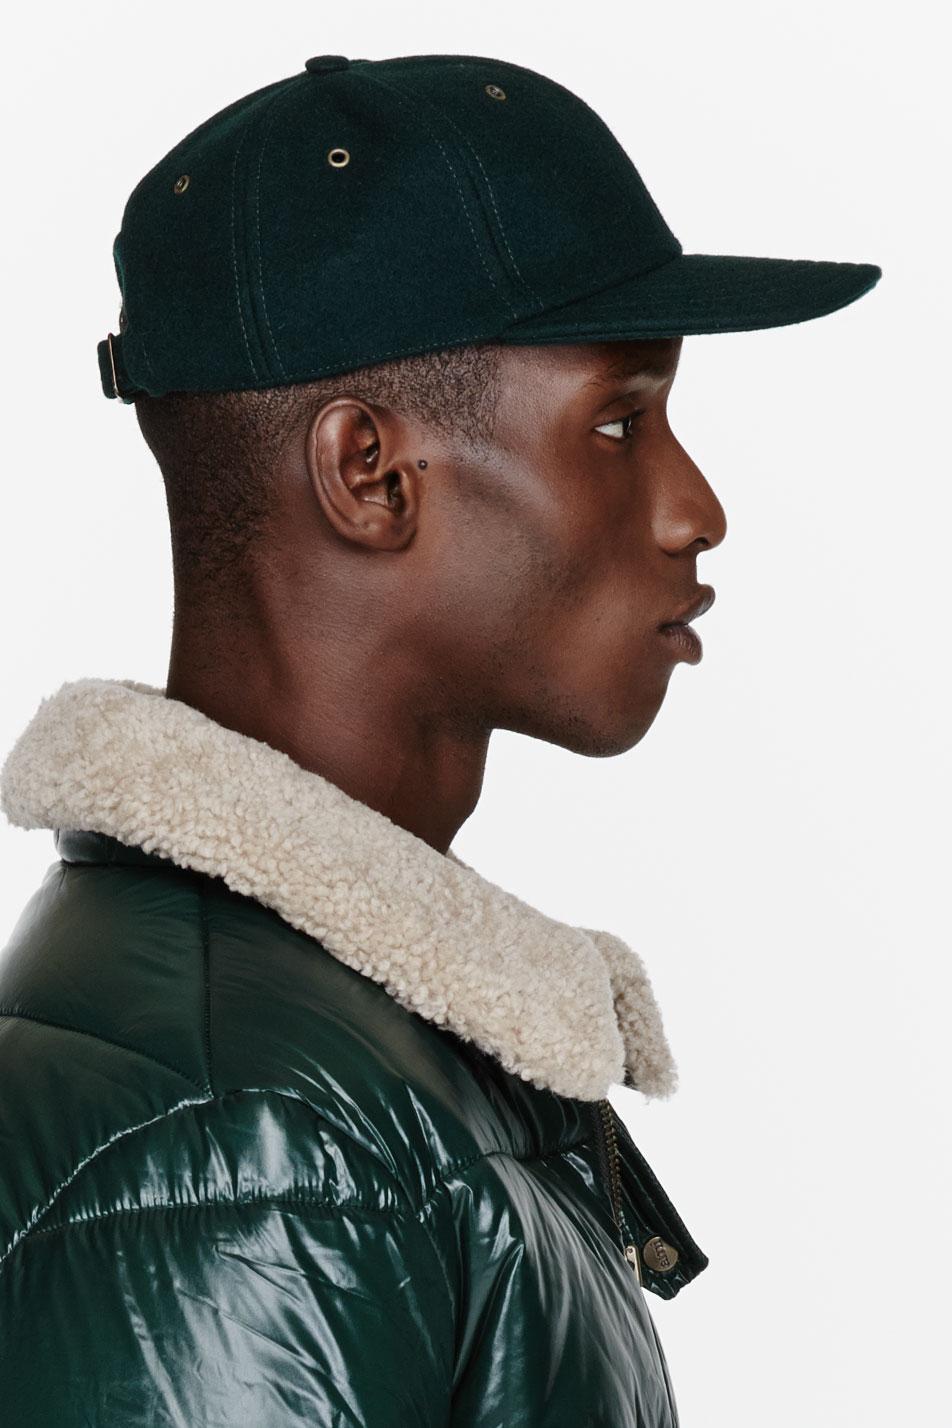 51a0fed3691f6 AMI Green Felted Wool Baseball Cap in Green for Men - Lyst